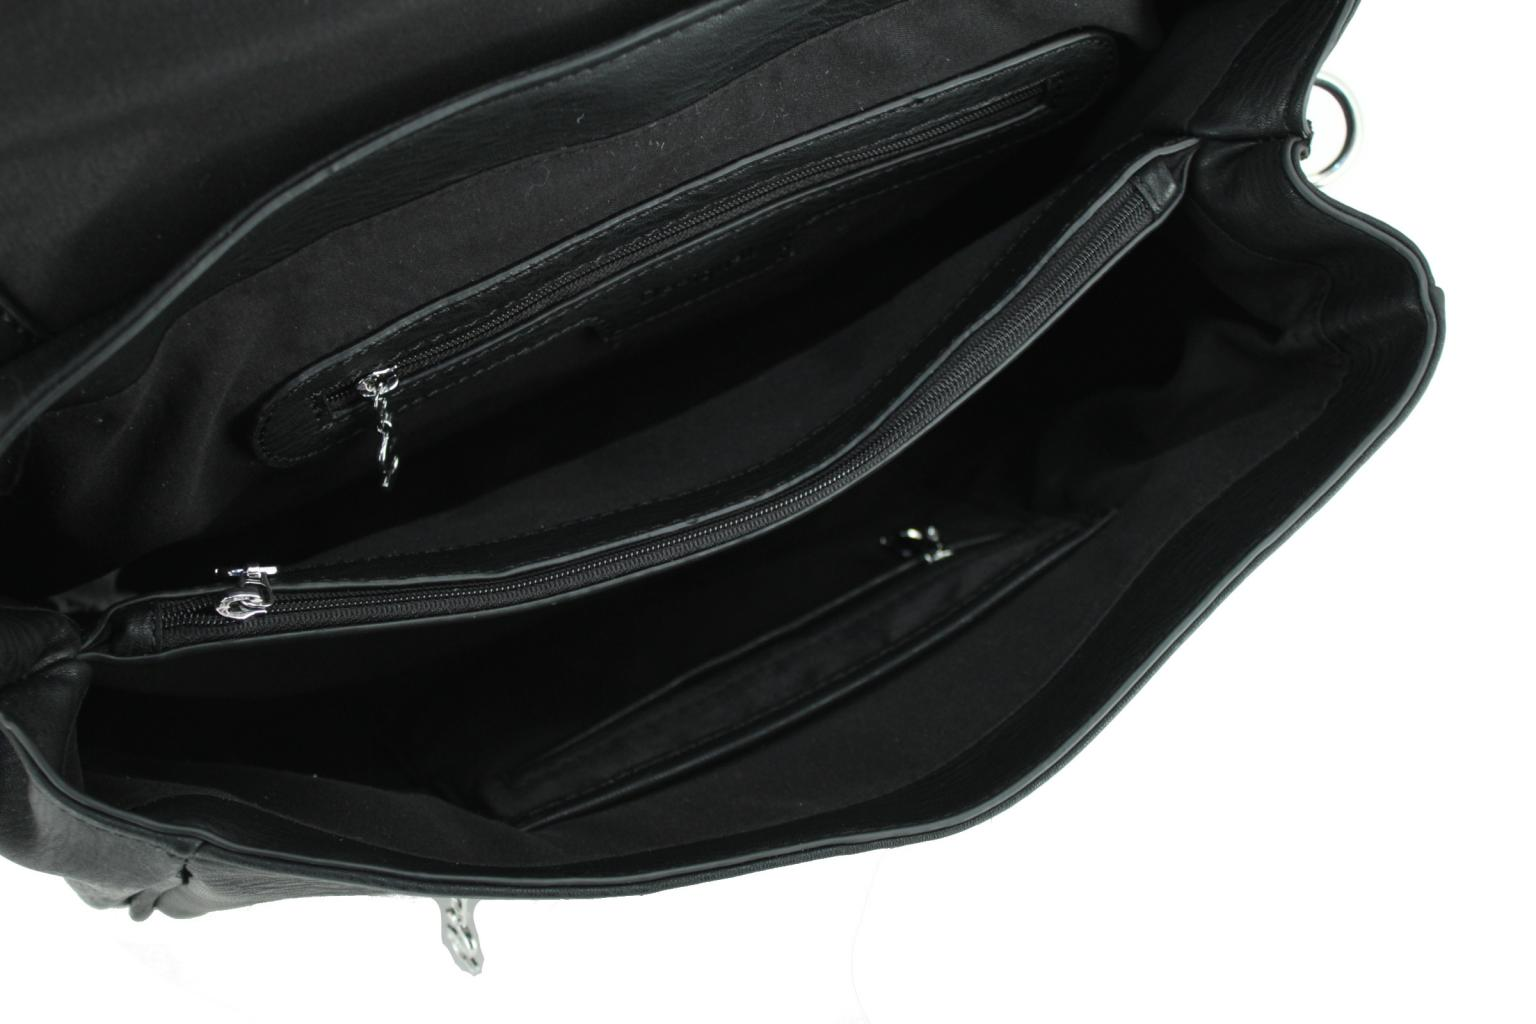 f05406e2d03ff Überschlagtasche Desigual Tivoli Dixie schwarz Nieten Glitzer - Bags ...